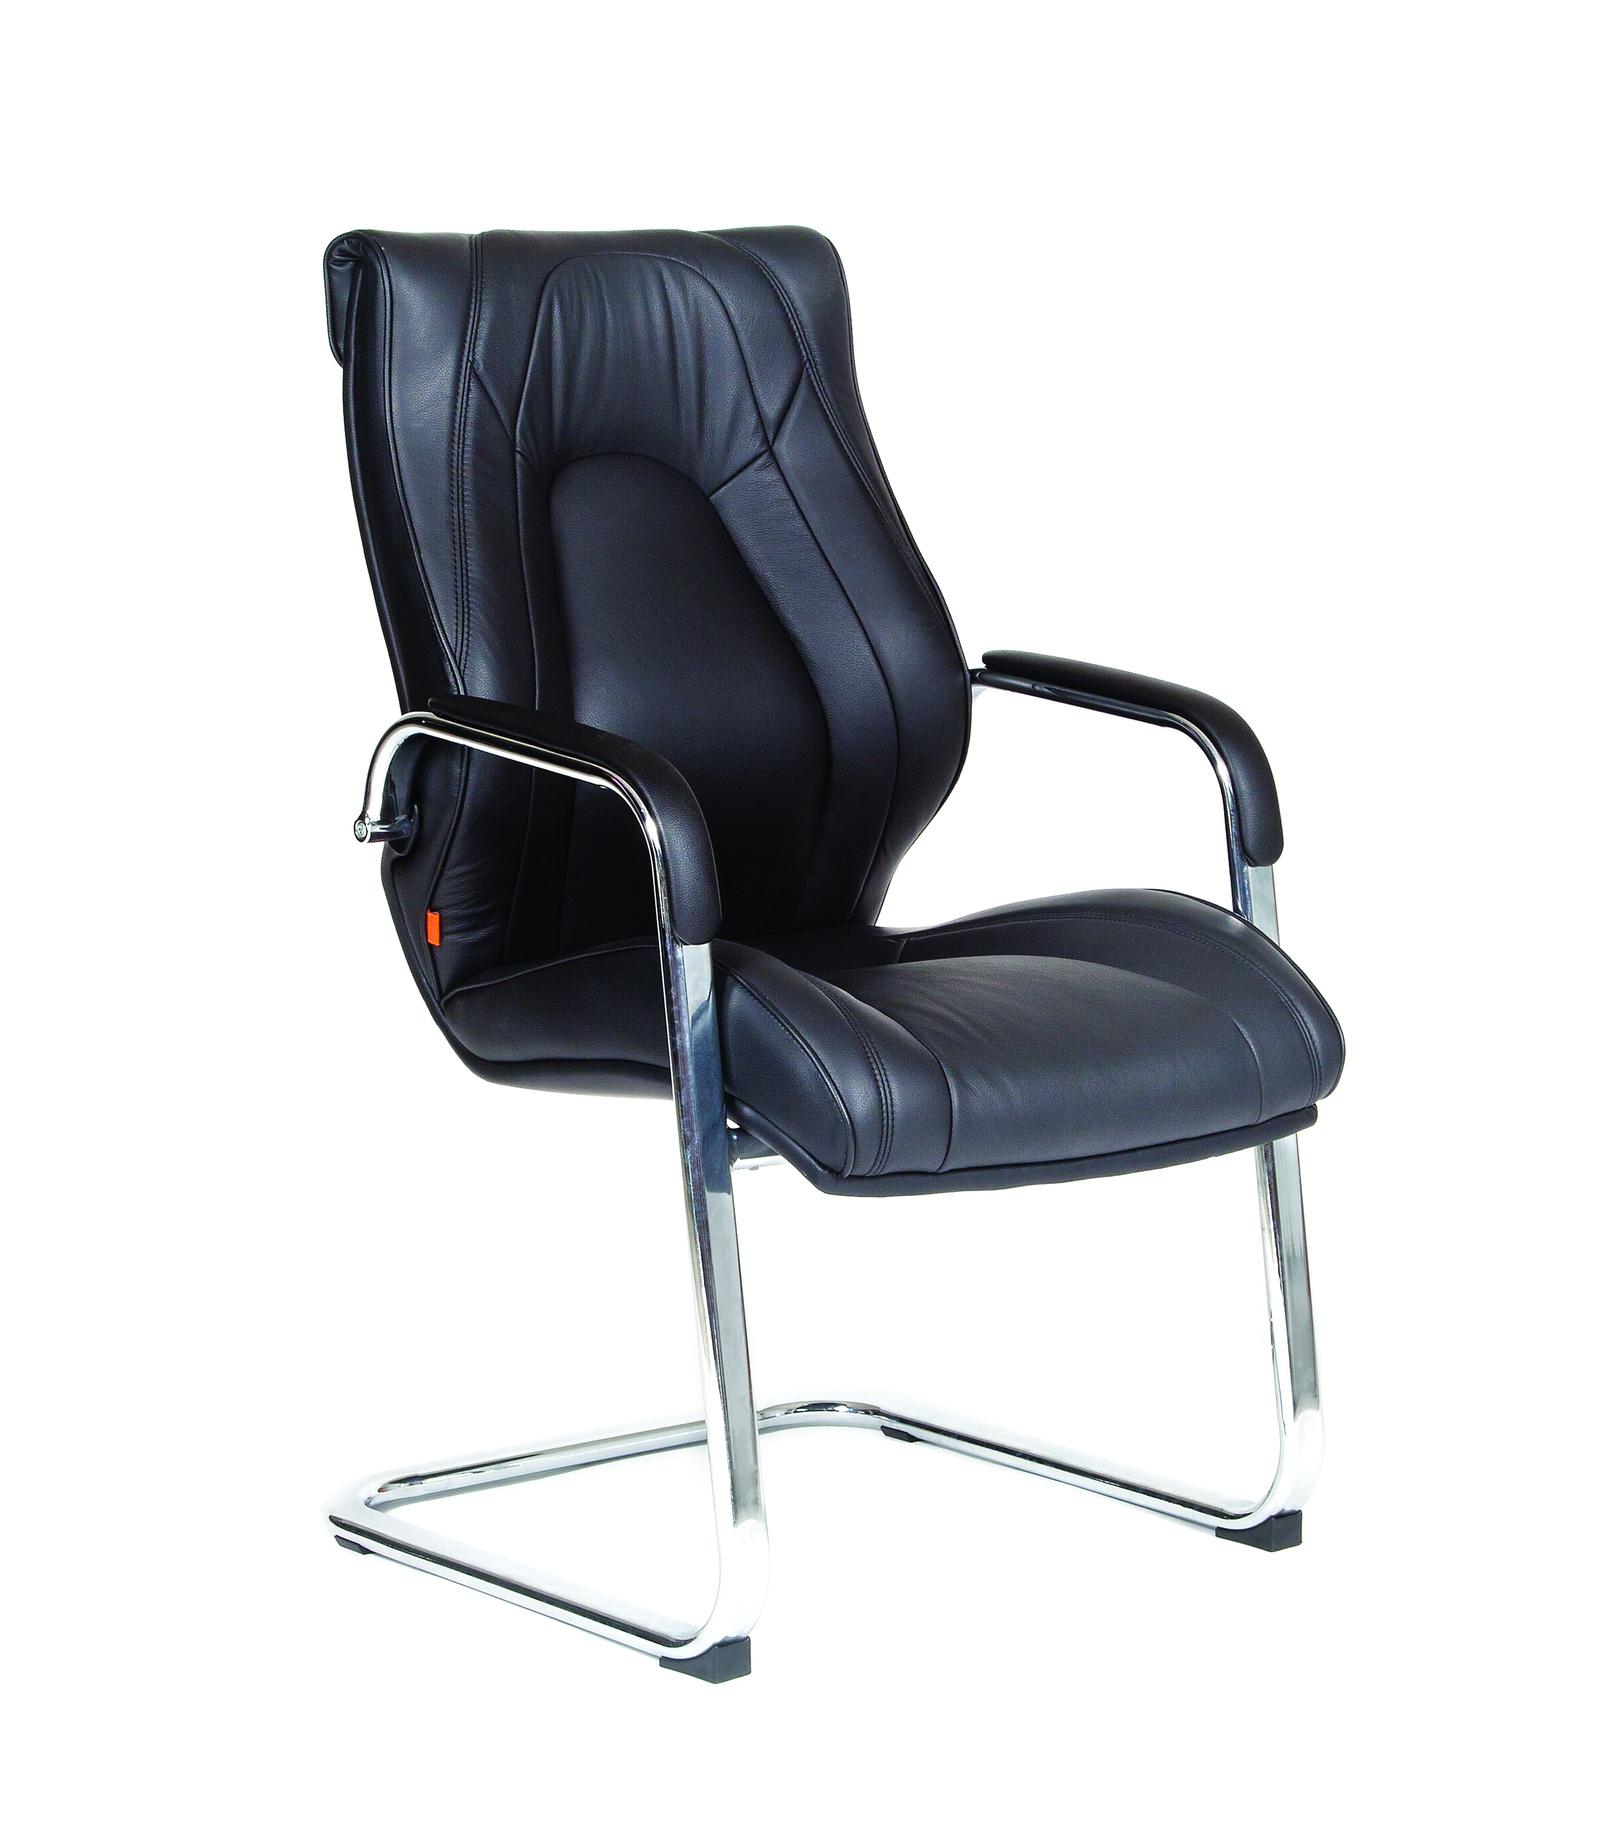 Офисное кресло CHAIRMAN FUGA V офисное кресло chairman fuga черный